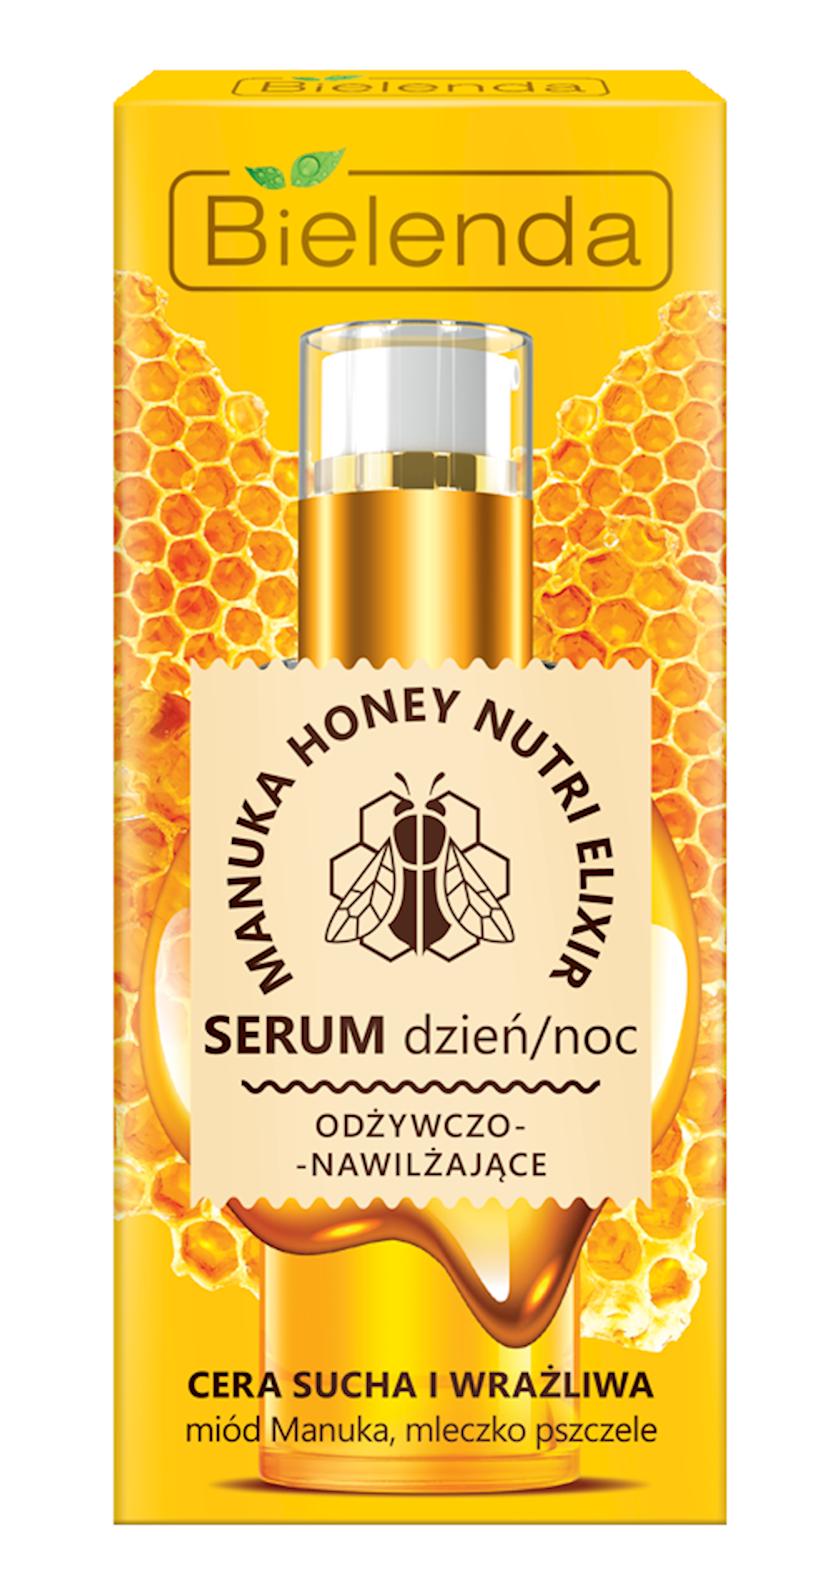 Zərdab Bielenda Manuka Honey Nutri Elixir 30 ml